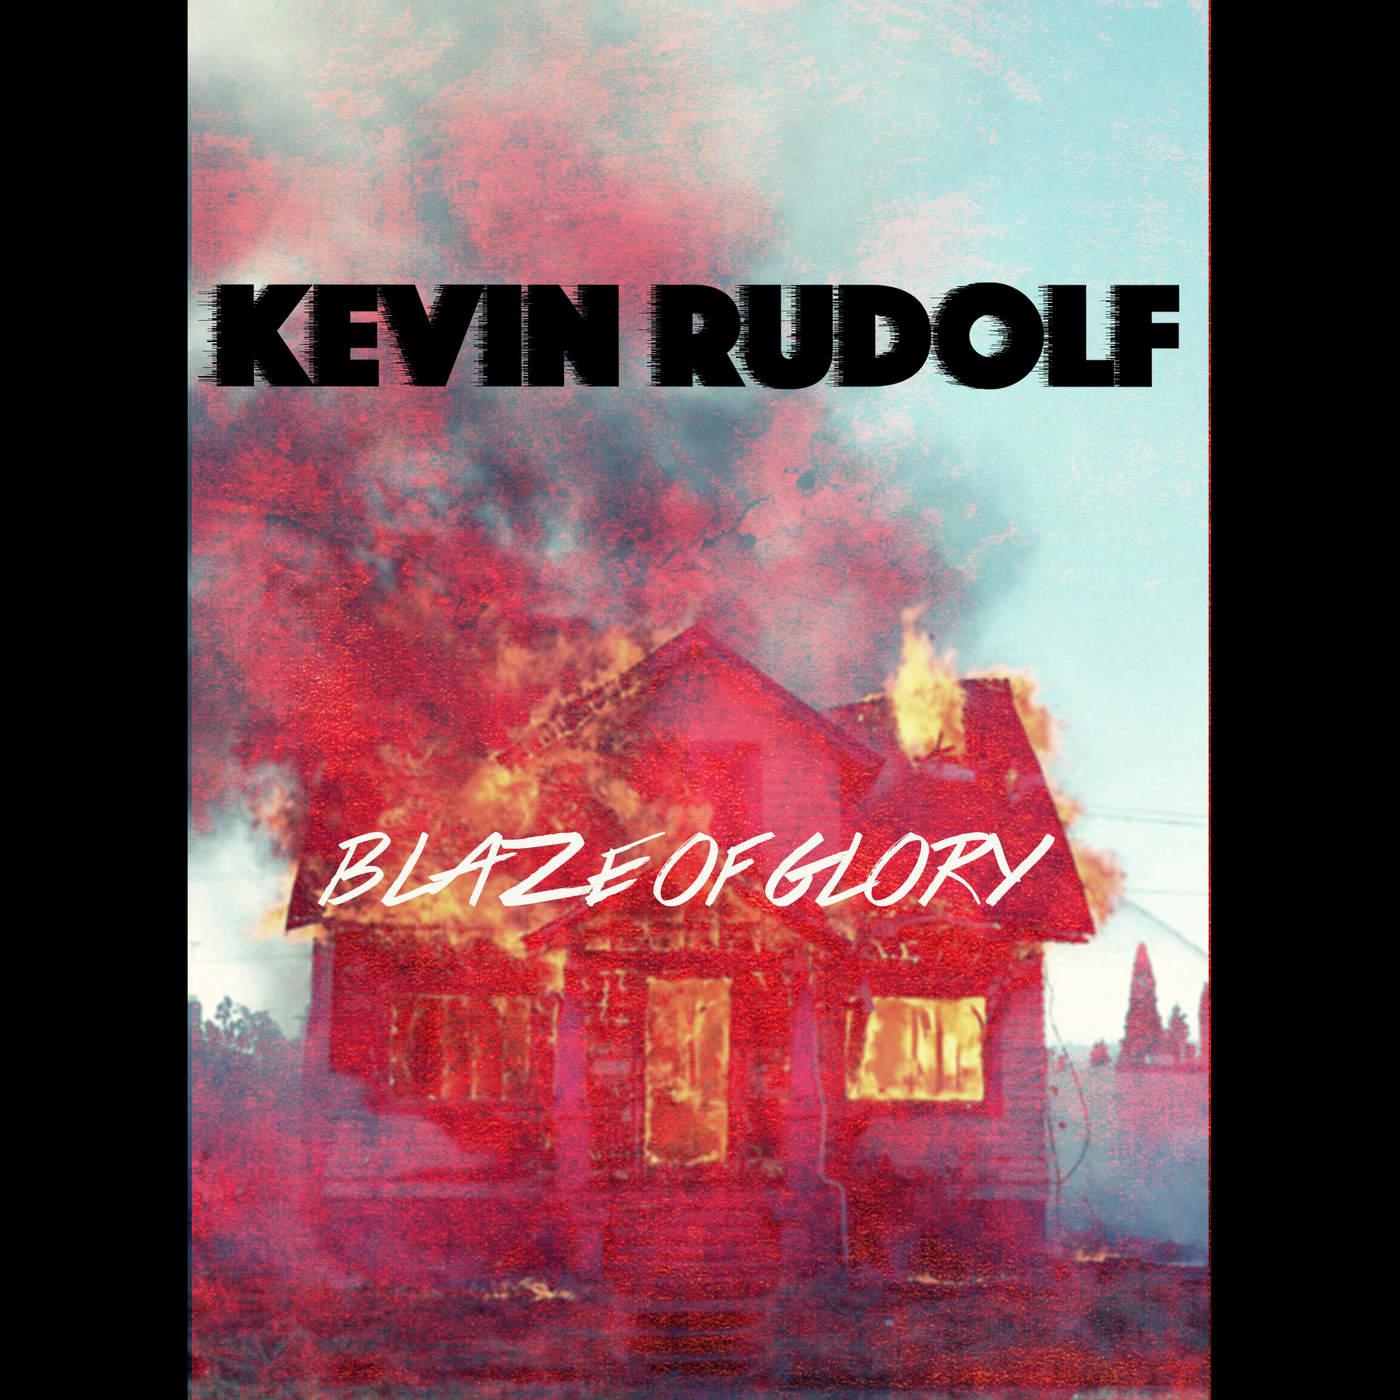 Kevin Rudolf - Blaze of Glory - Single Cover